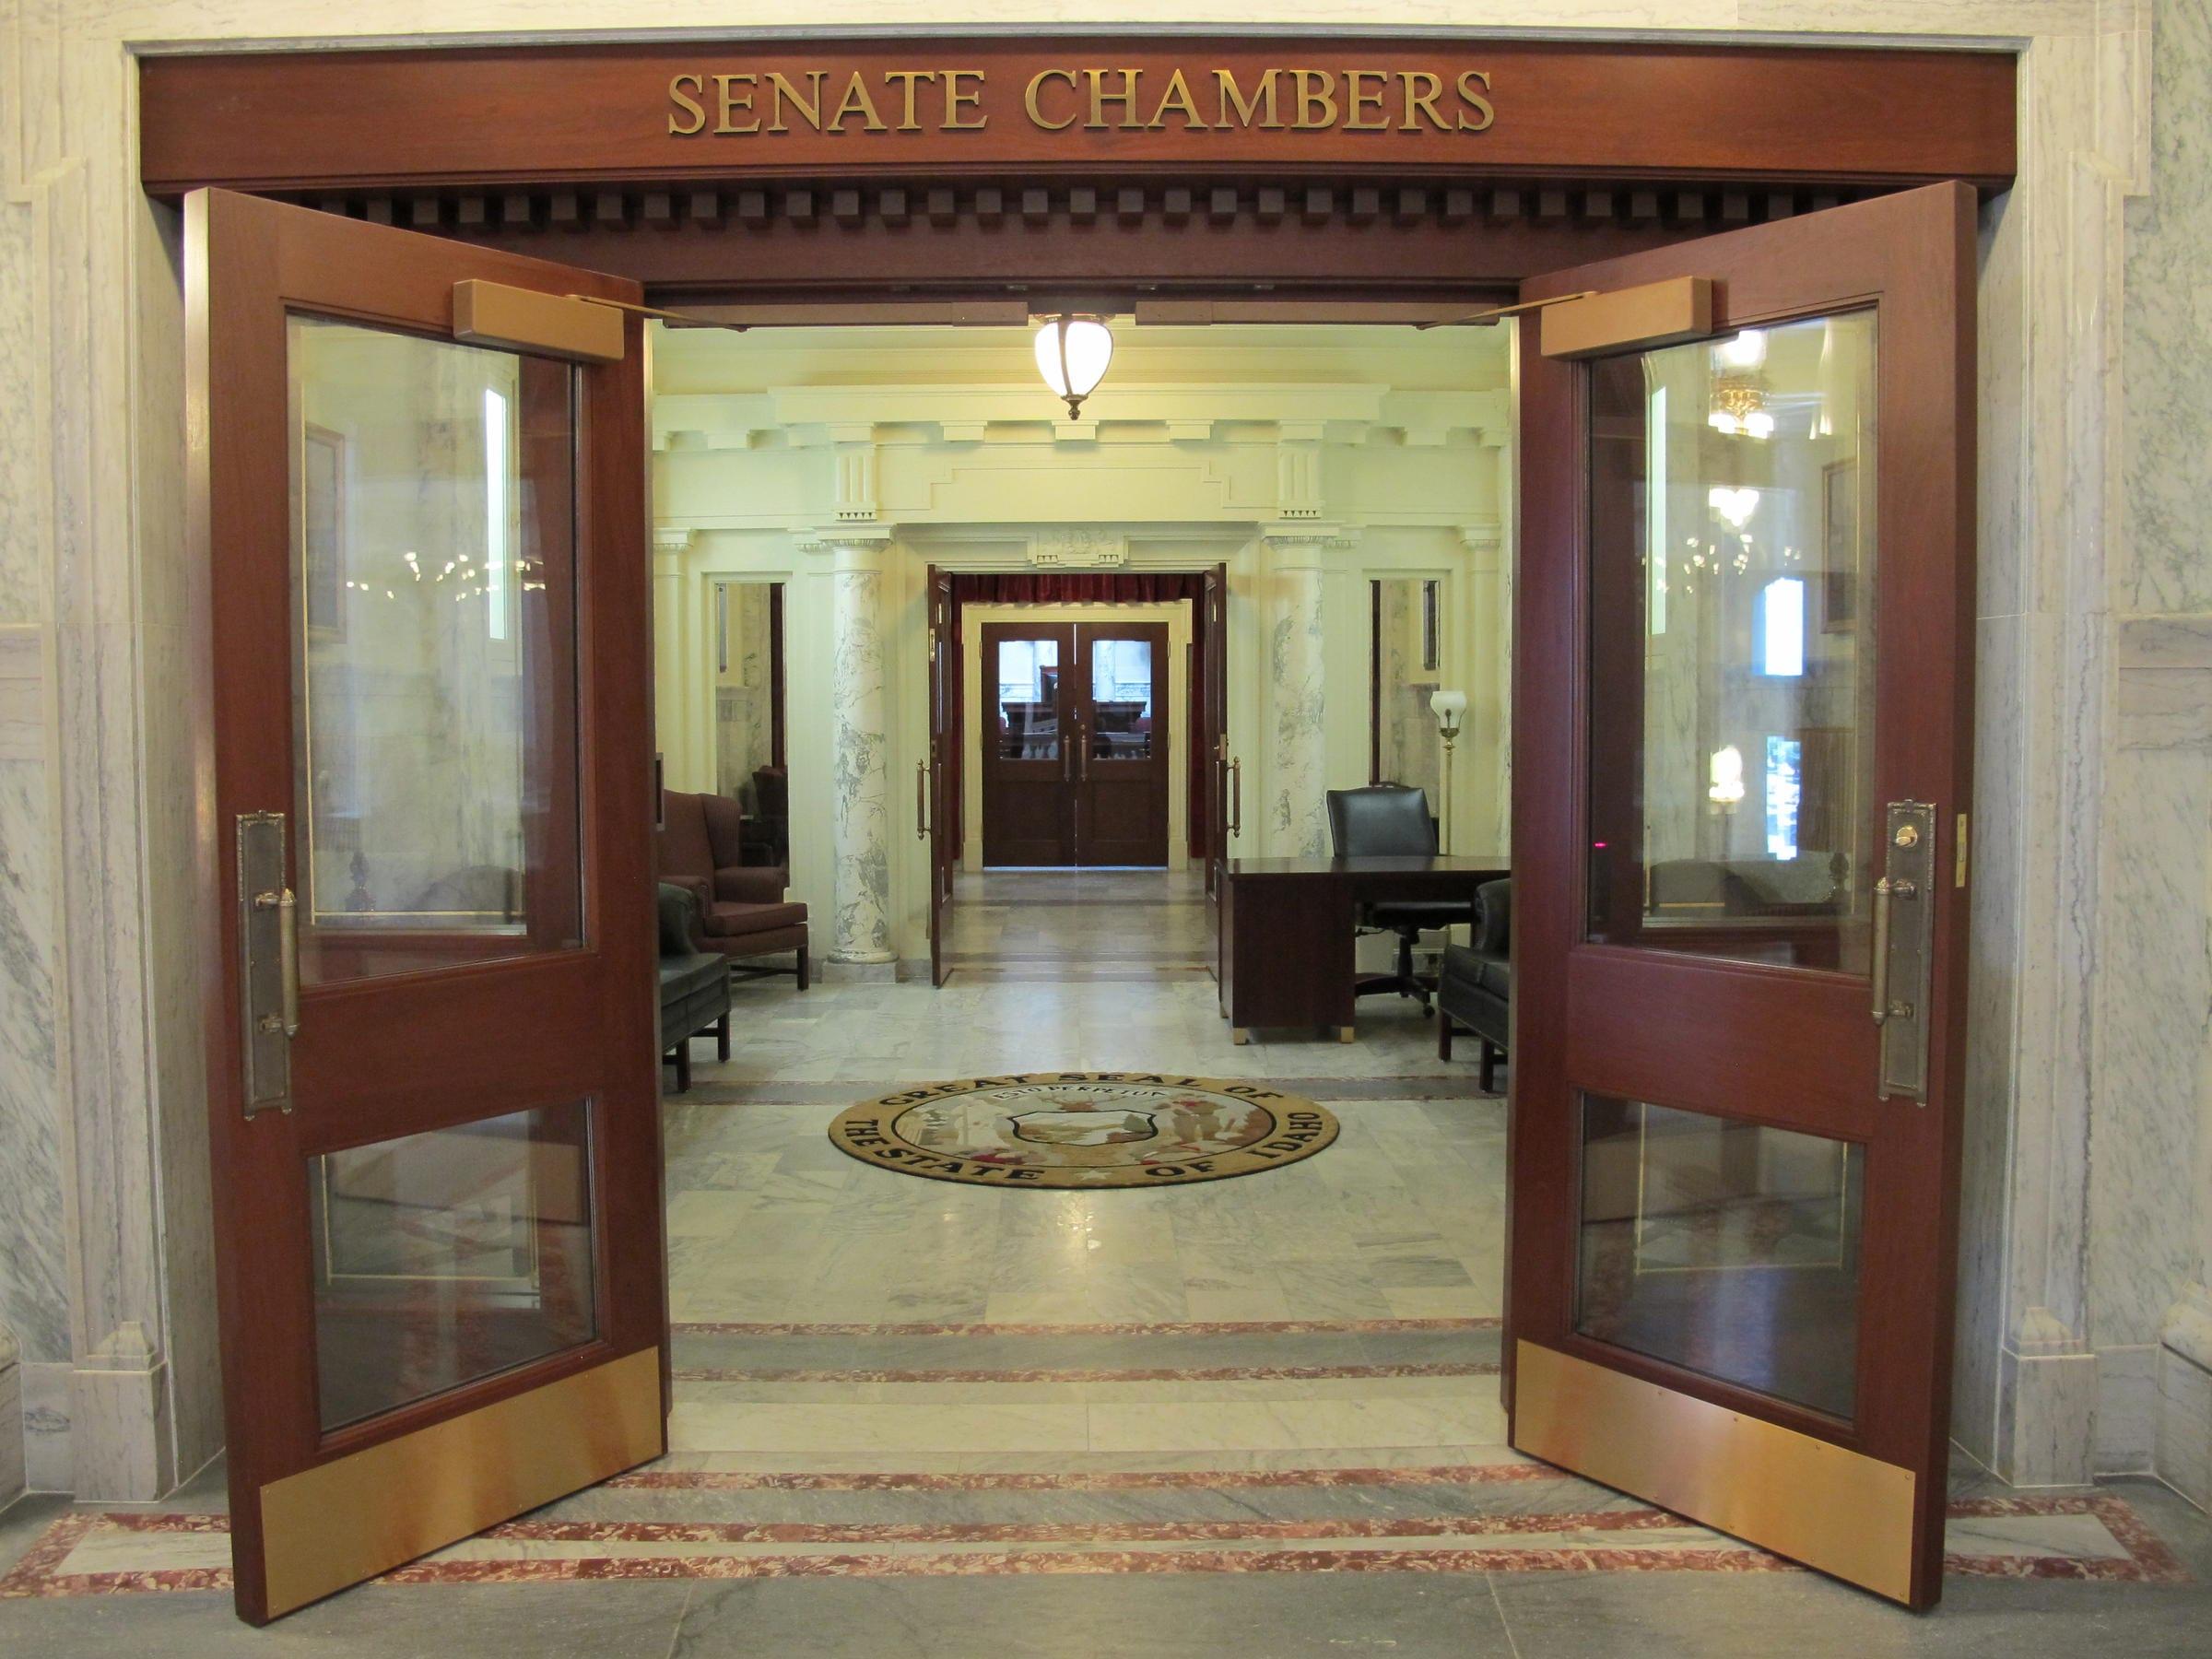 Idaho Quashed Motorcycle Profiling Bill in Senate